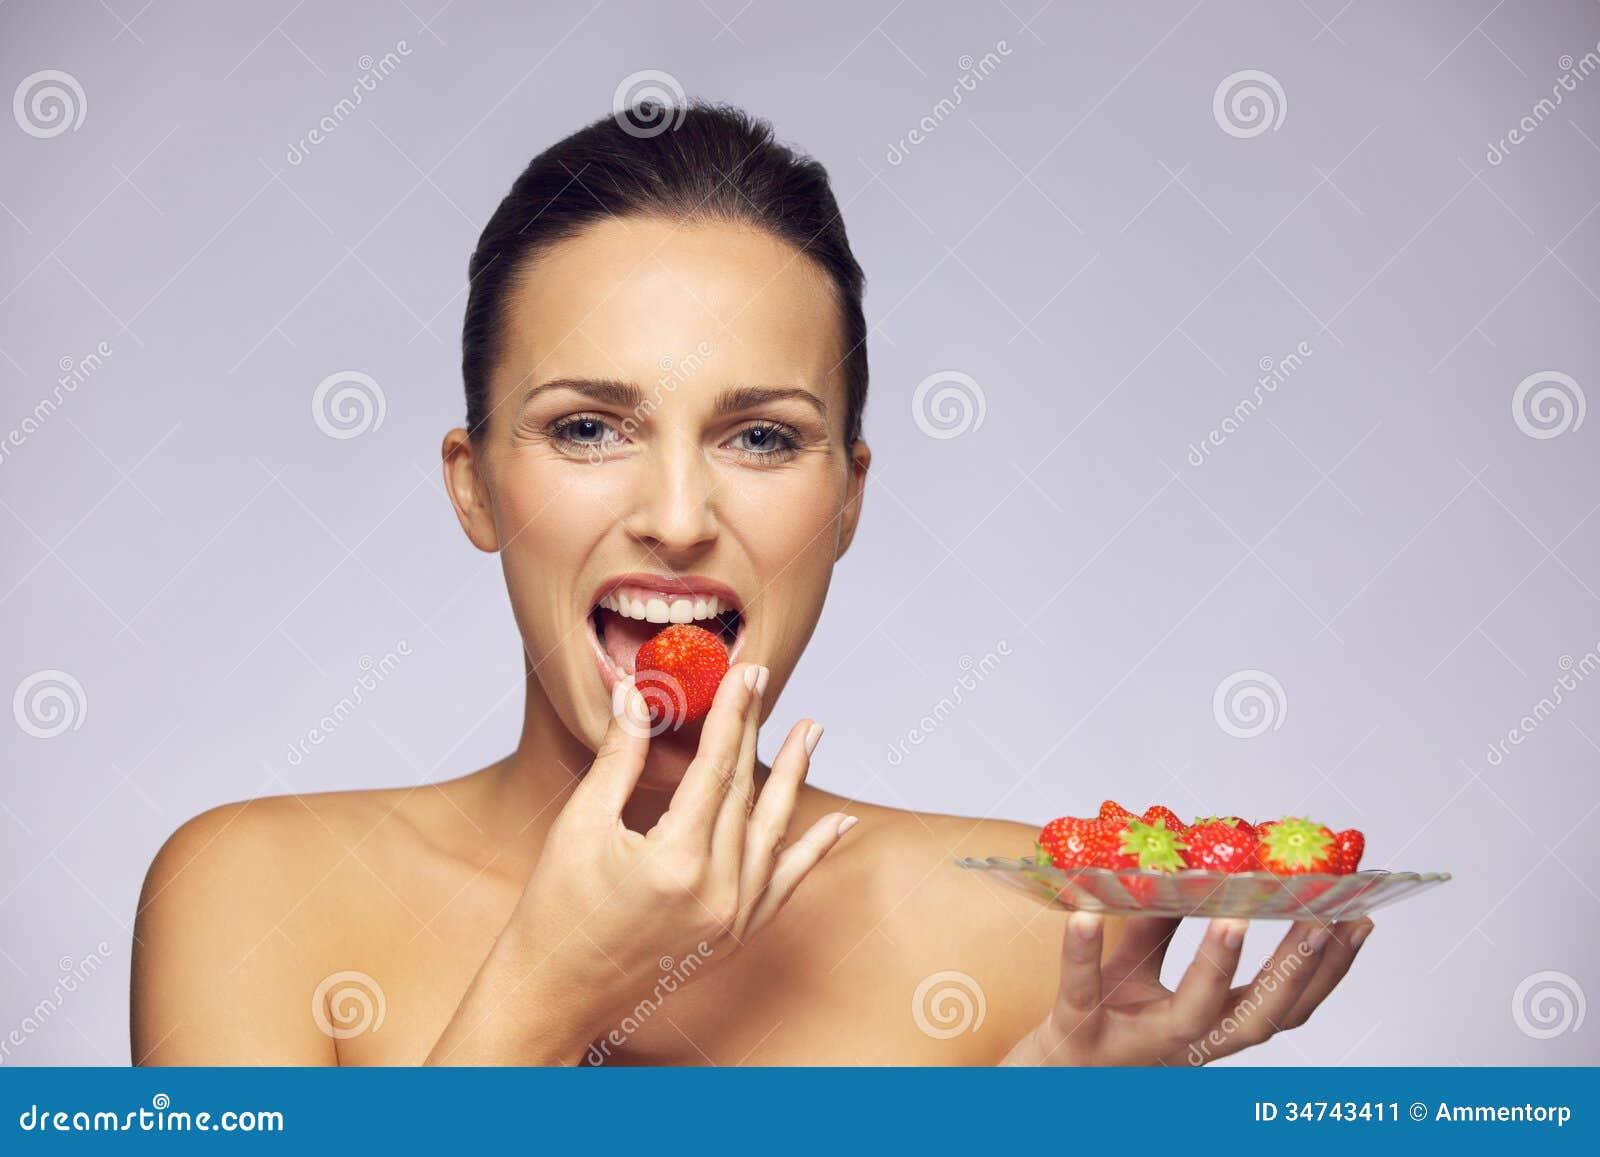 Beautiful Young Caucasian Woman Eating Healthy Fruits Stock